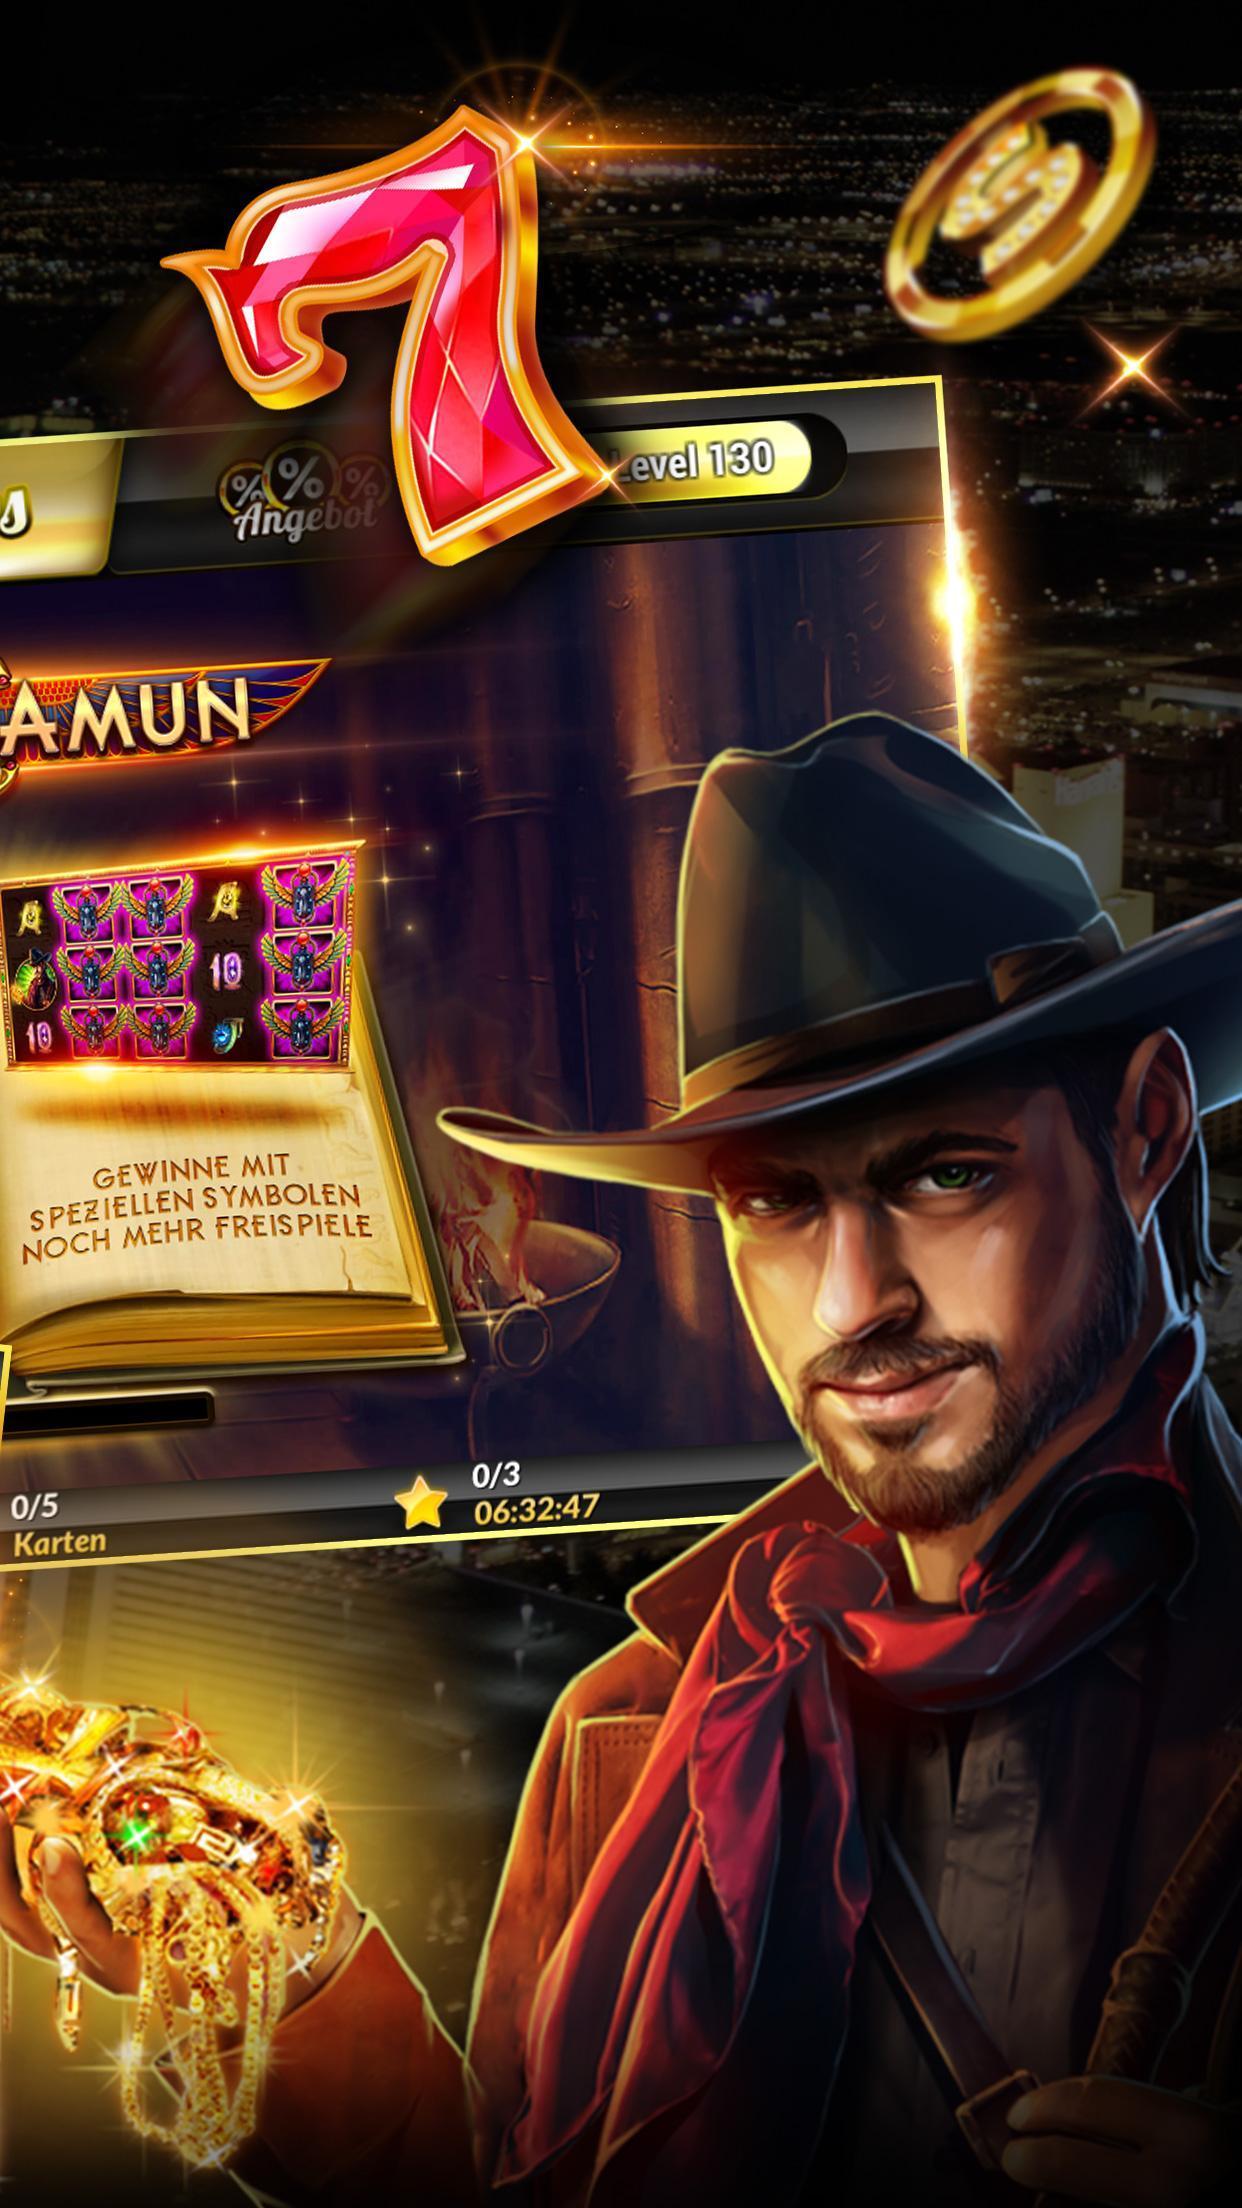 Slotigo Online-Casino, Spielautomaten & Jackpots 4.11.11 Screenshot 5